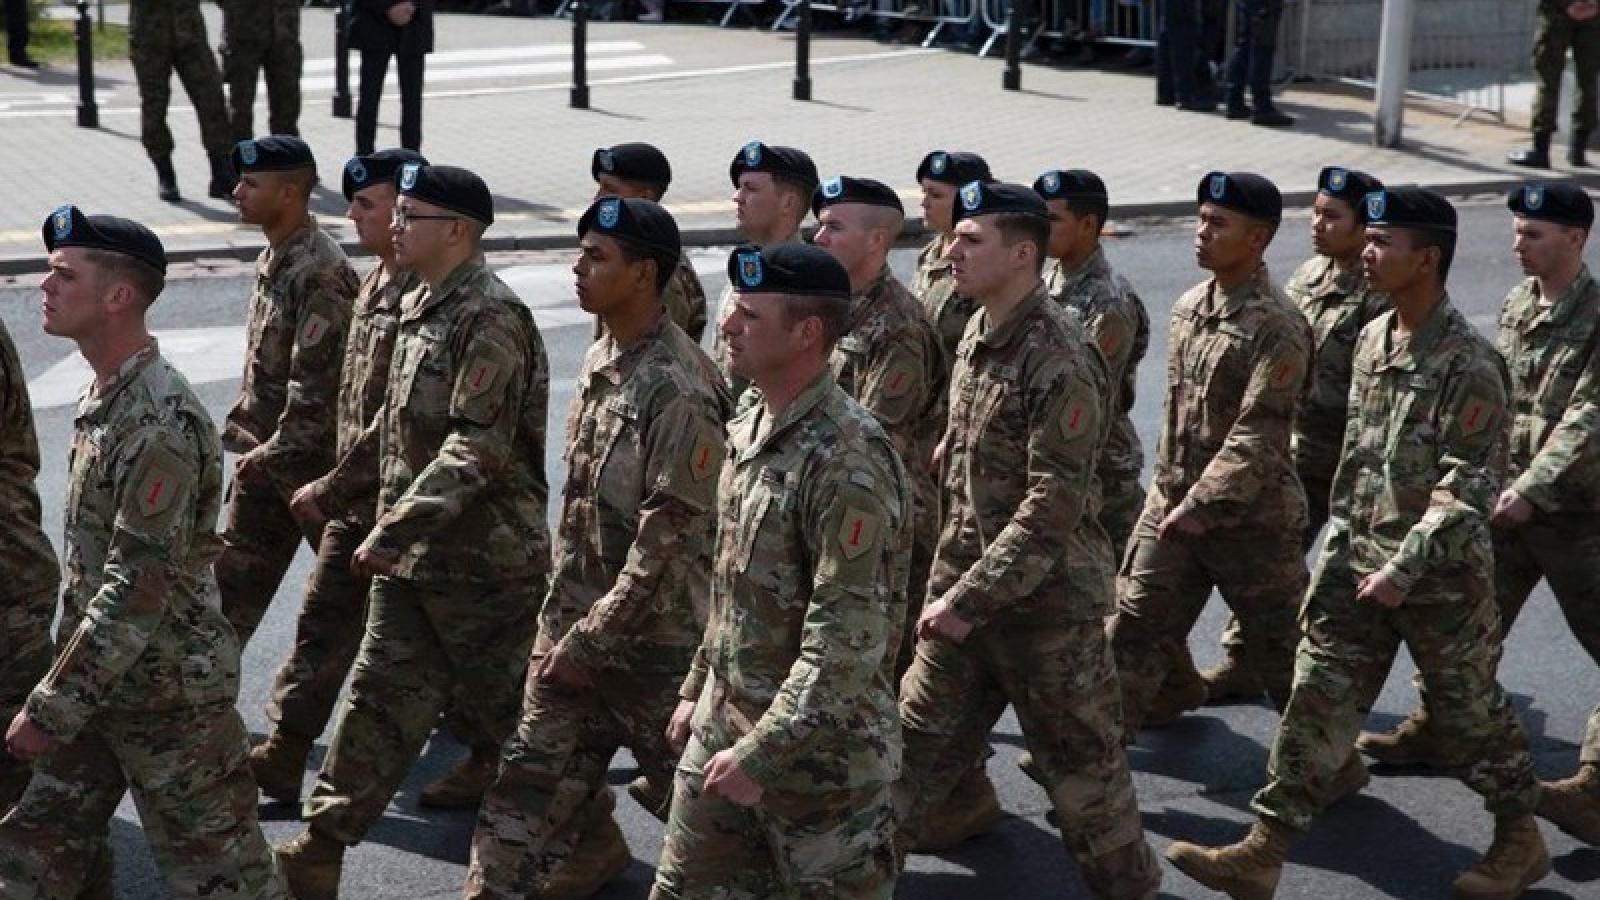 Mỹ sẽ triển khai thêm 1.000 binh sĩ đến Ba Lan